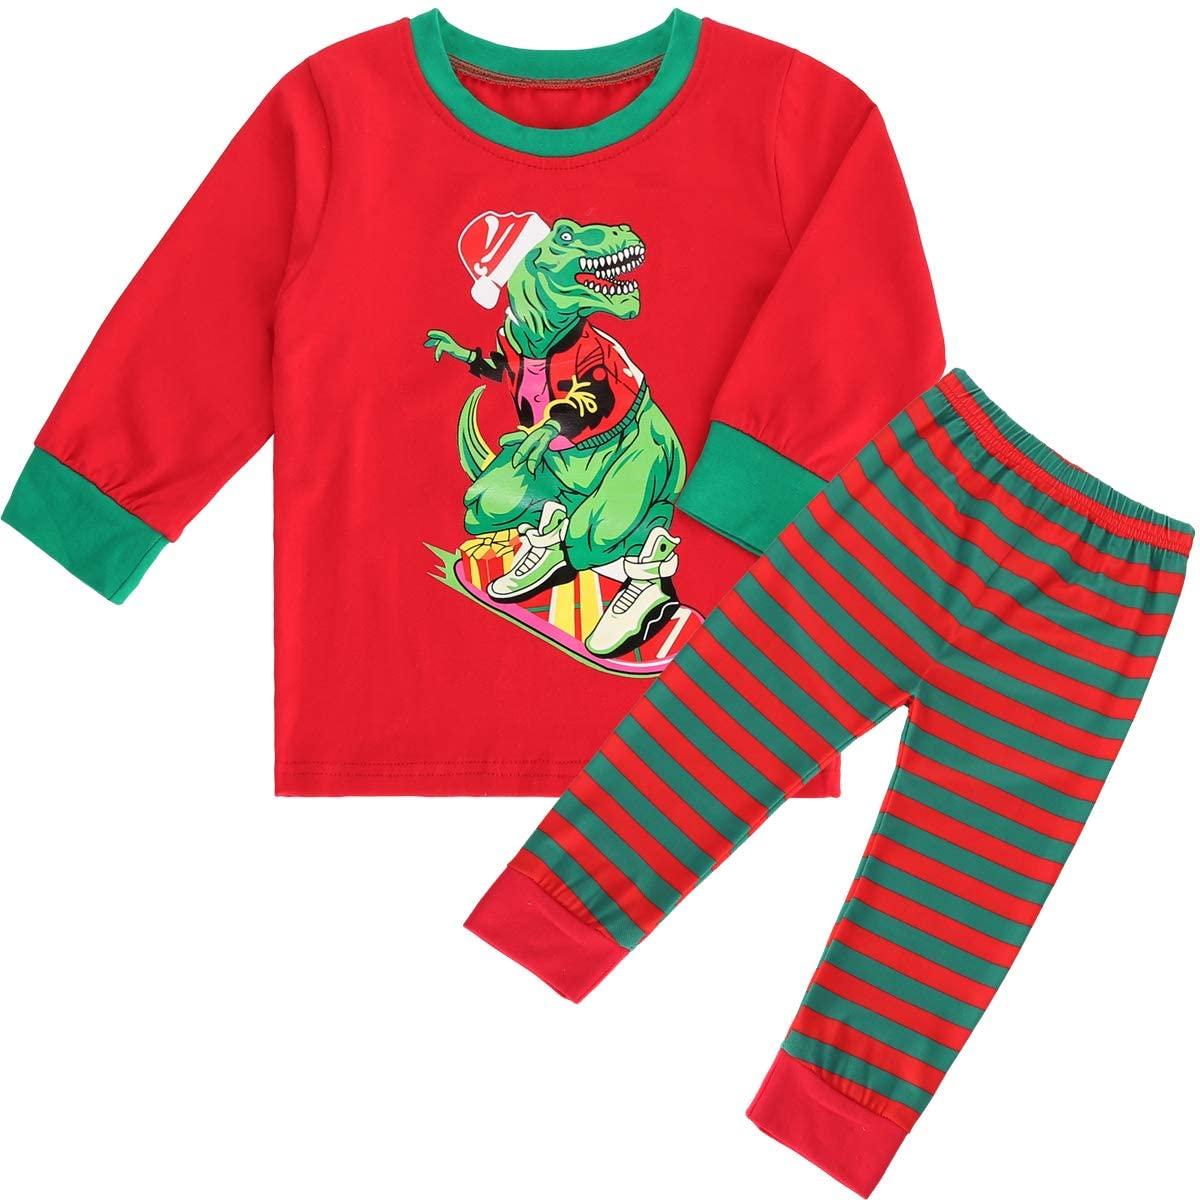 puseky 2pcs Kids Toddler Boys Girls Christmas Dinosaur Pajamas Outfits Set Long Sleeve Shirt and Pants